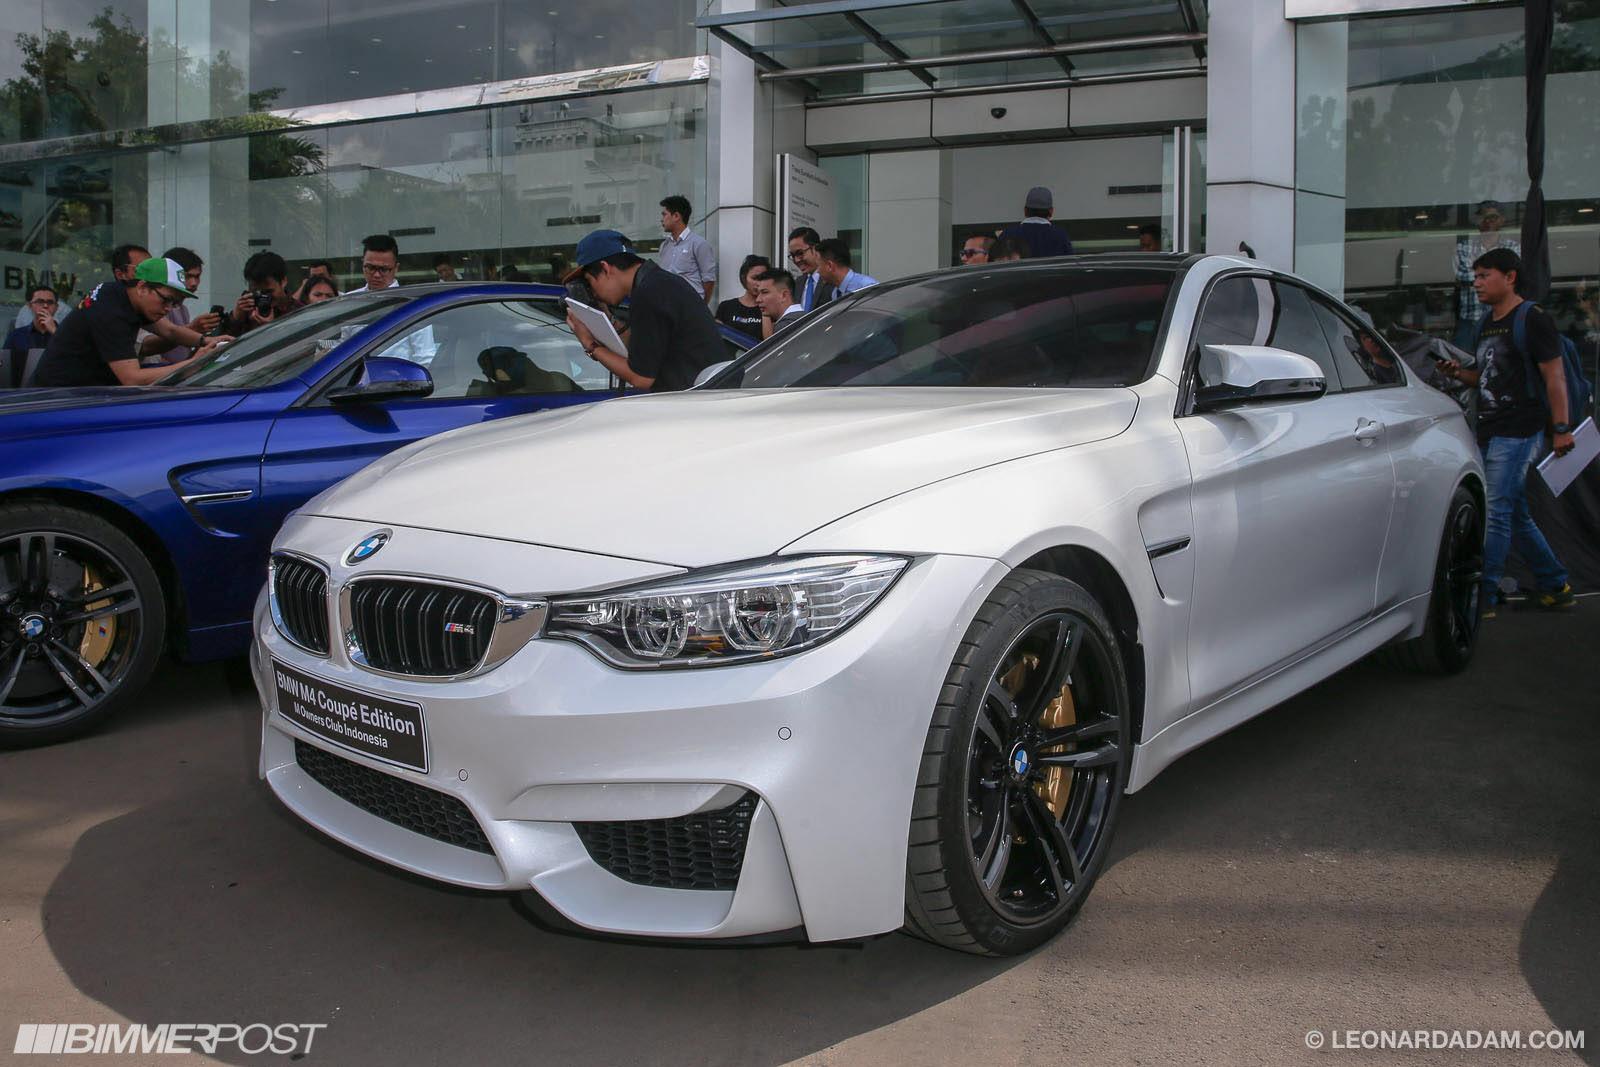 Harga BMW M4 GTS 2016 diumumkan